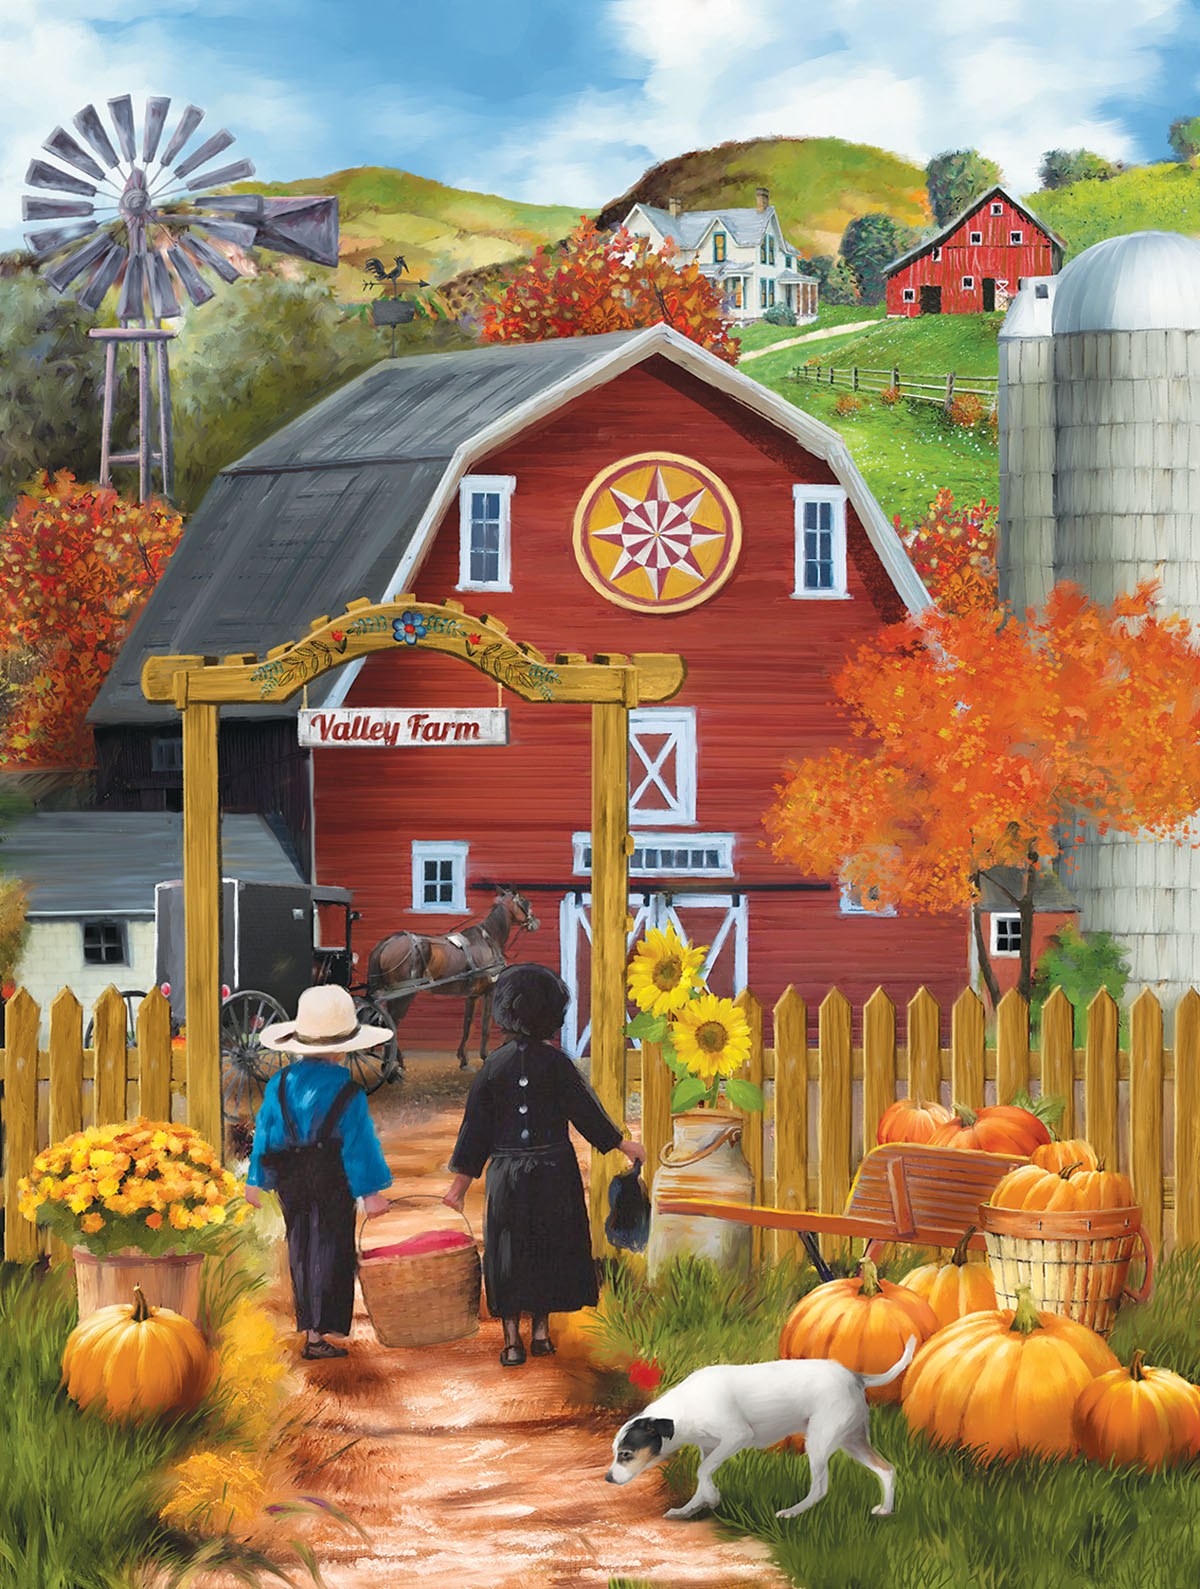 Valley Farm Farm Jigsaw Puzzle